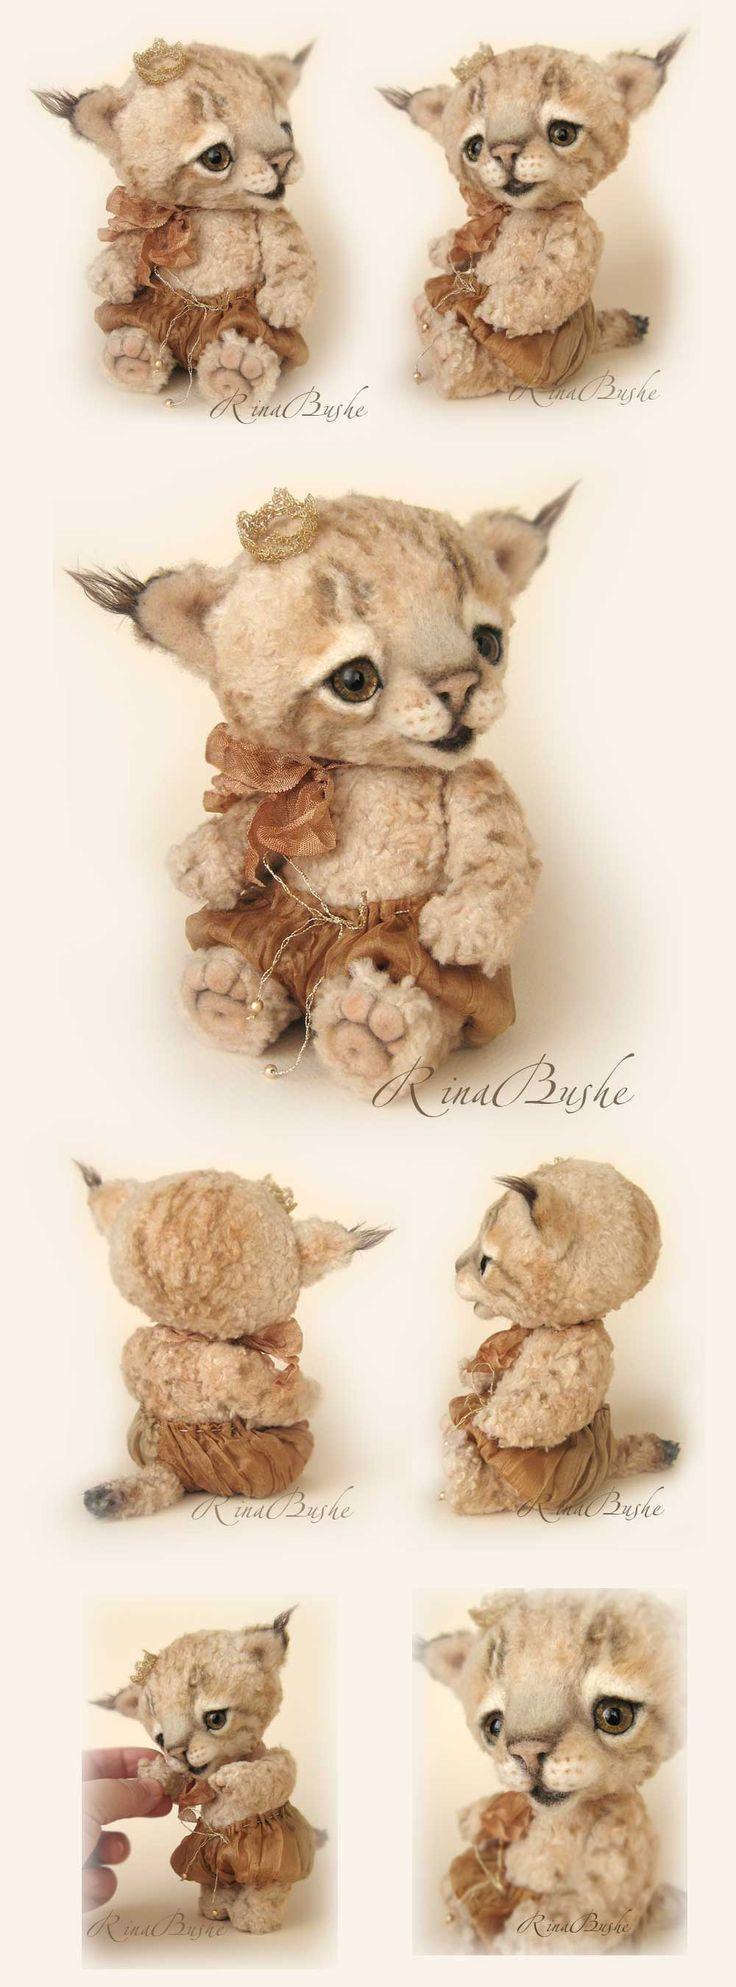 This site has super cute stuffed animals